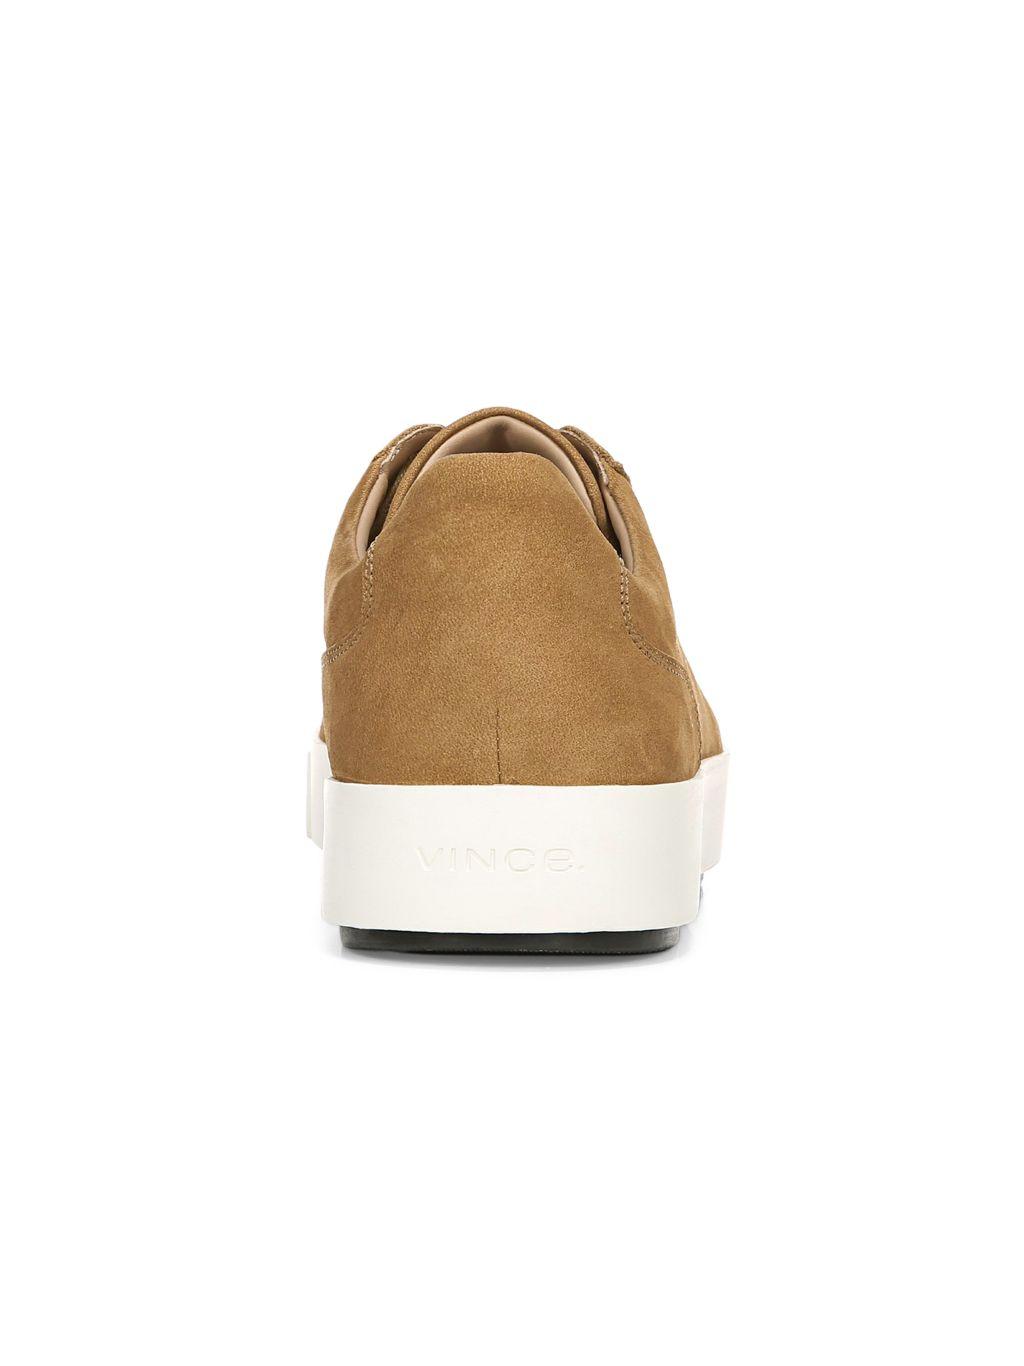 Vince Lamont Waterproof Low-Top Leather Sneakers